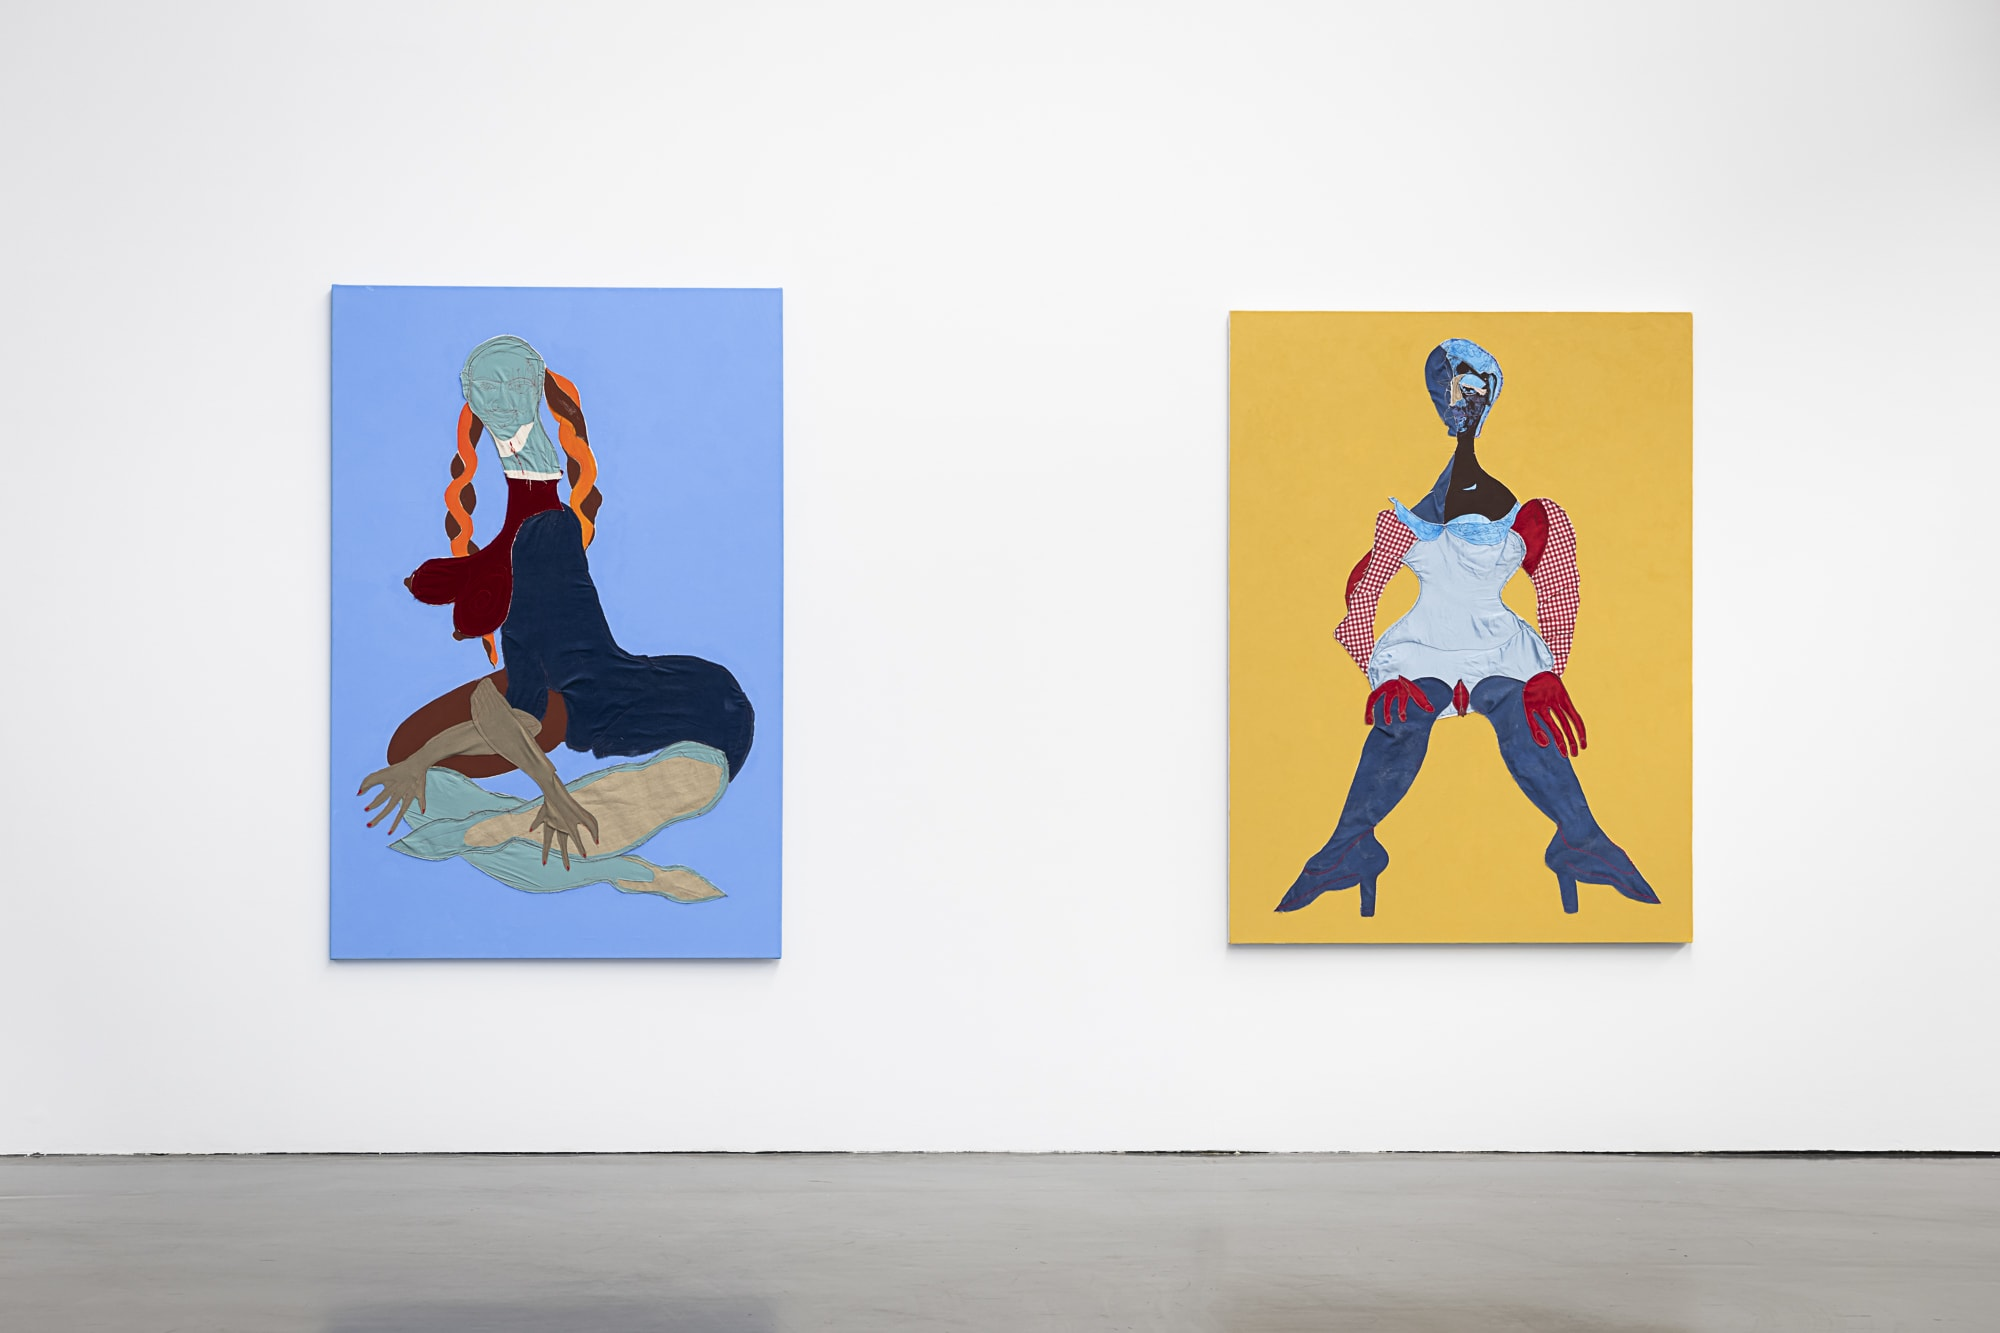 Christina Quarles and Tschabalala Self Journey Through A Body